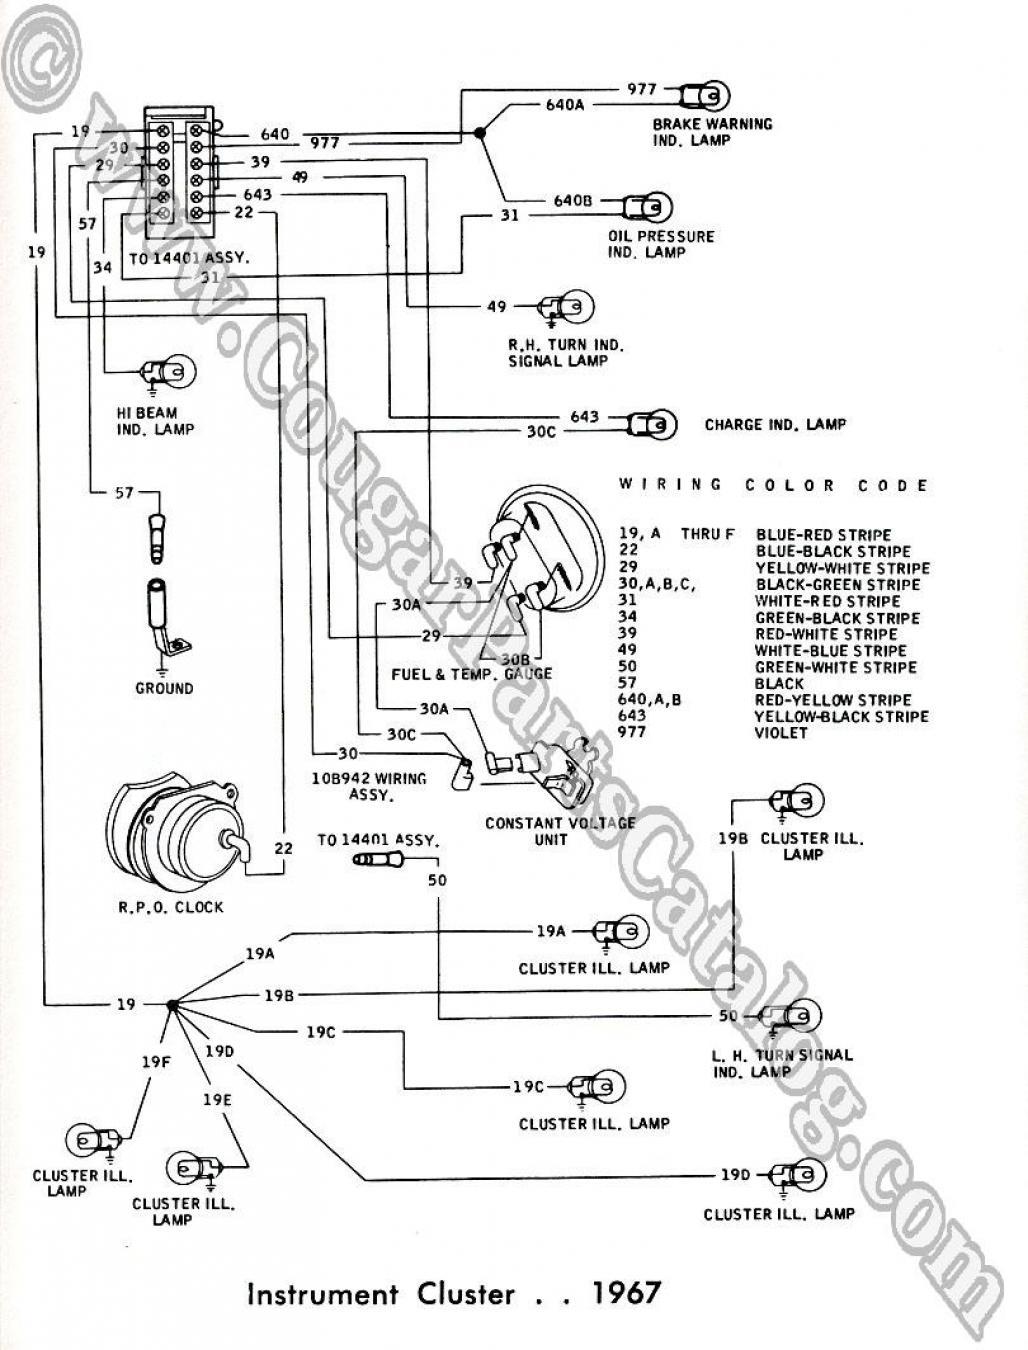 Kn 7093 Thunderbird Wiring Diagram On 1967 Mercury Cougar Turn Signal Wiring Free Diagram